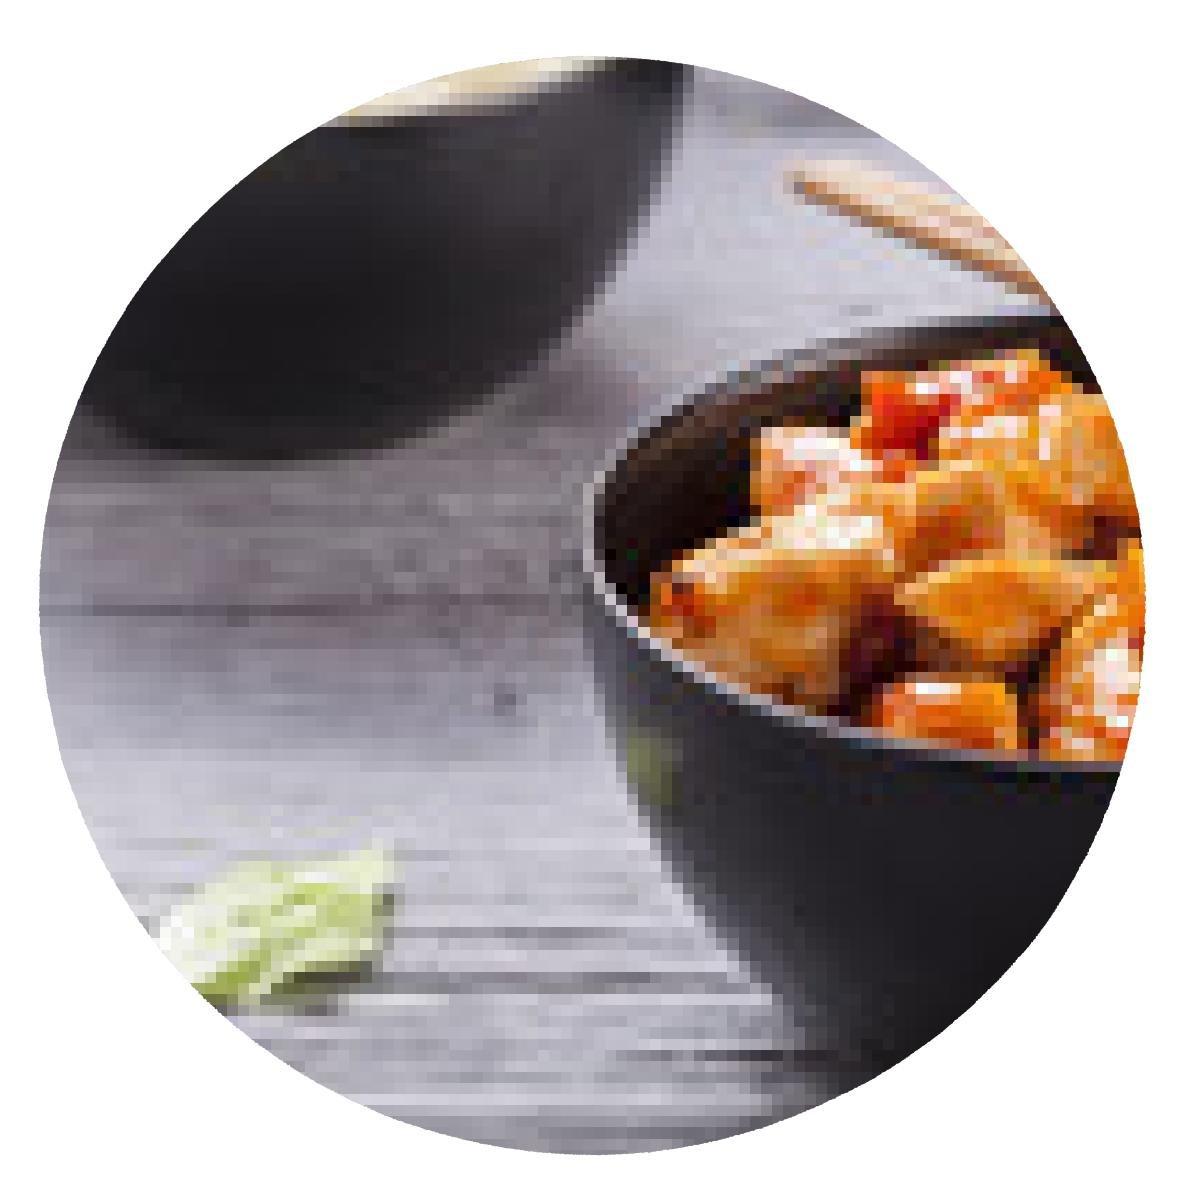 alfombrilla de ratón china de pollo salsa agridulce: Amazon.es: Electrónica